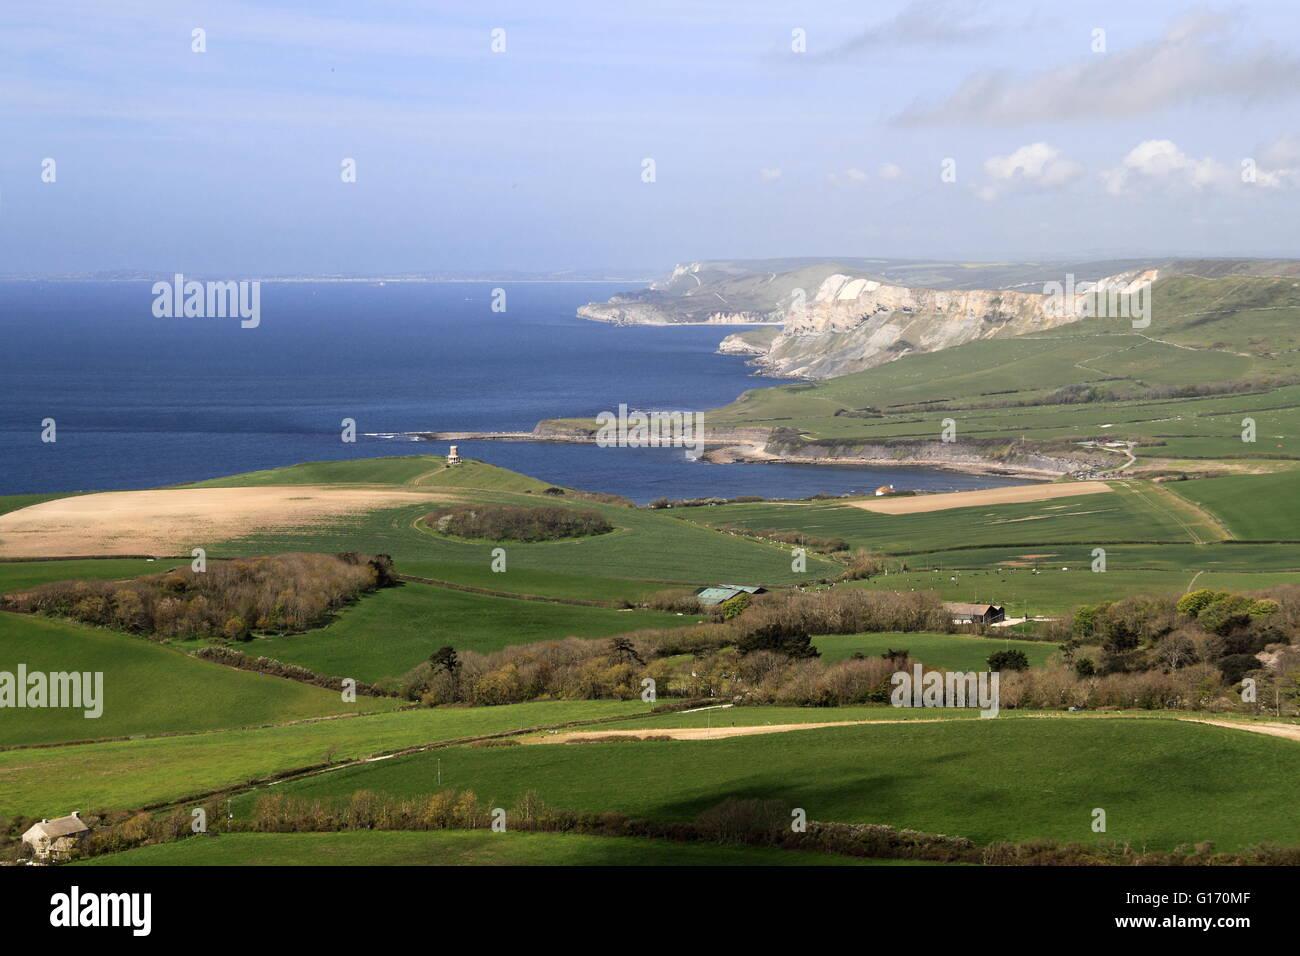 Kimmeridge de cabeza Swyre, Kingston, Purbeck Corfe, la Costa Jurásica, en Dorset, Inglaterra, Gran Bretaña, Reino Unido, UK, Europa Foto de stock